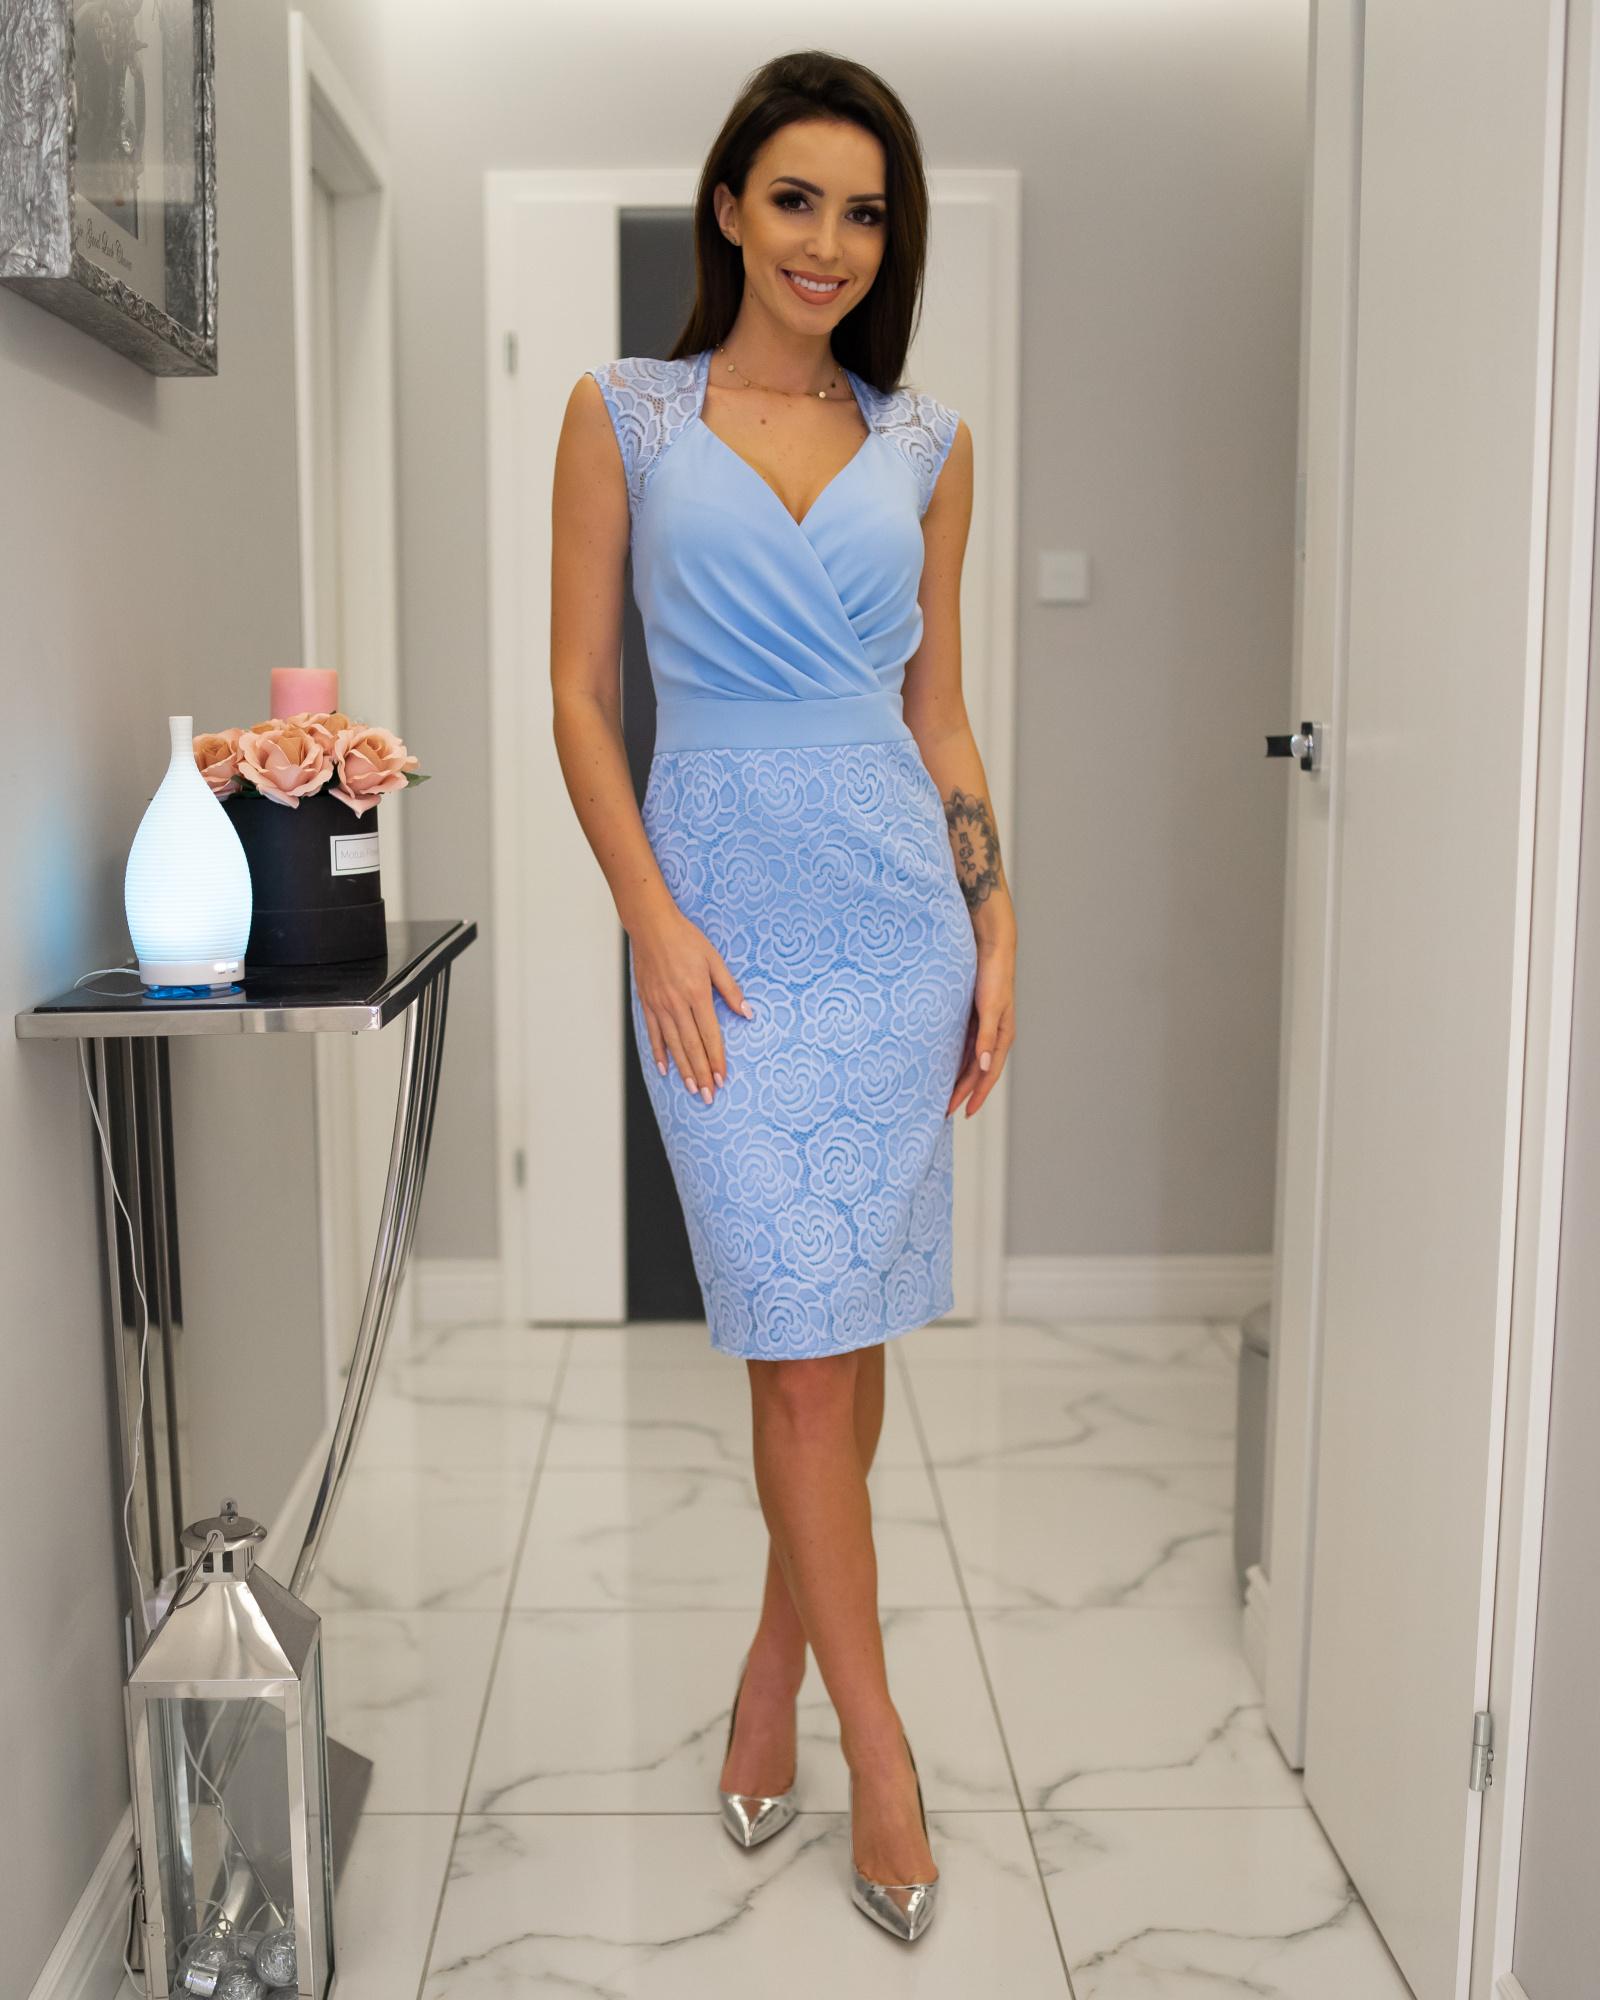 cbc31f3265 Lara -Elegancka sukienka wizytowa KM311-4 - ❤ Kartes-Moda ❤